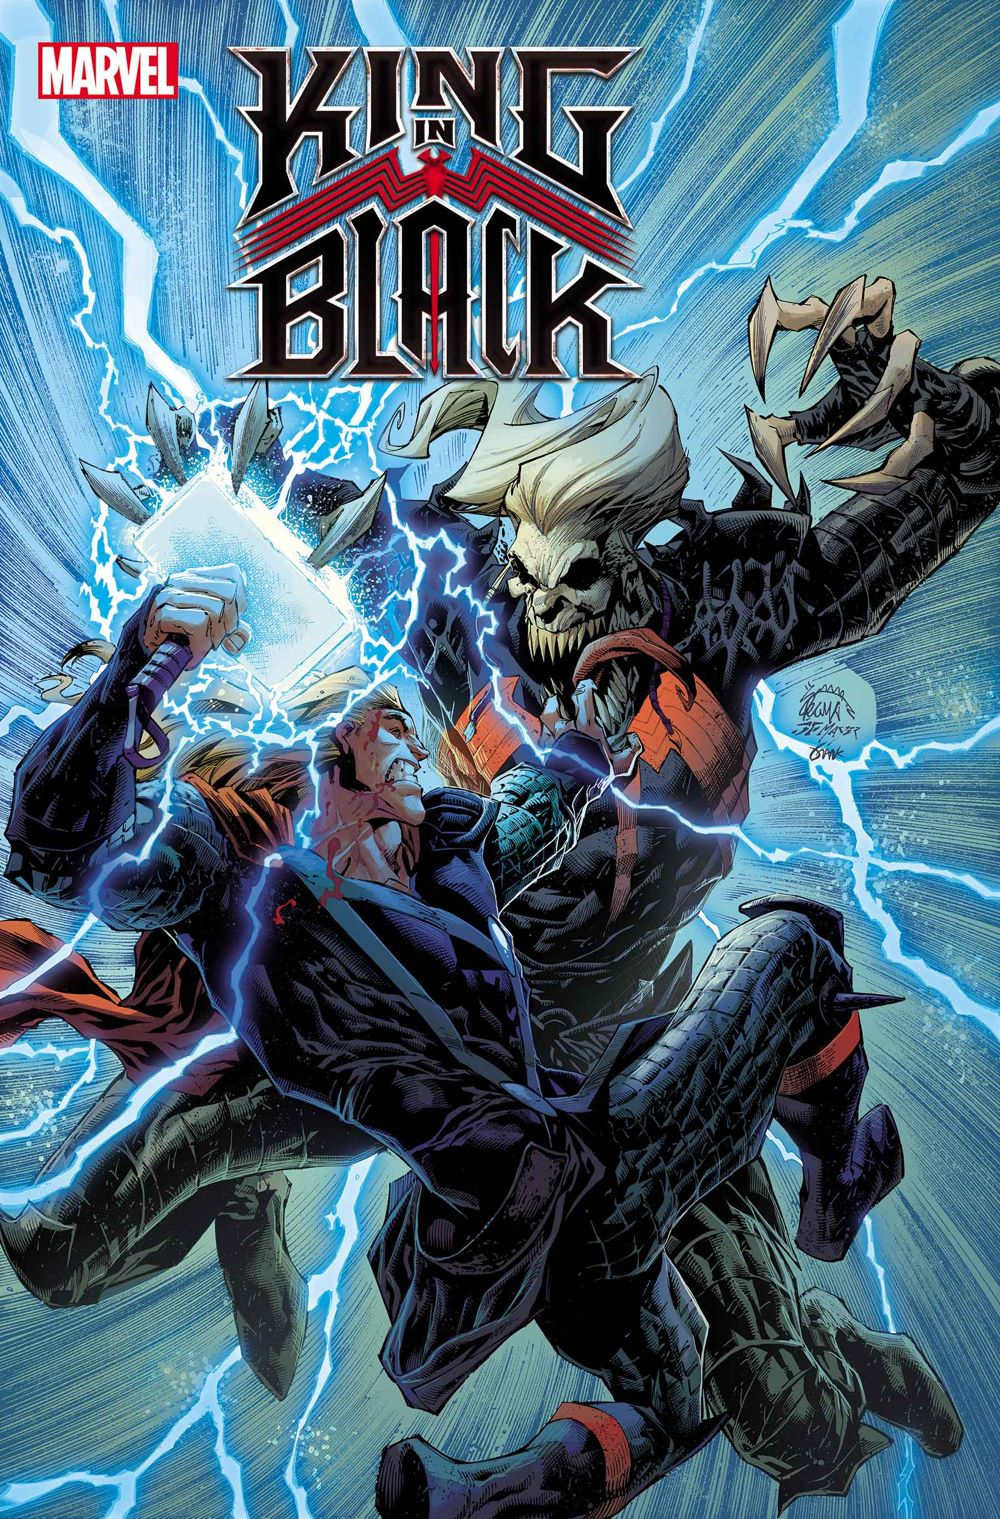 KINGINBLACK2020003_cvr-1 Marvel Comics January 2021 Solicitations